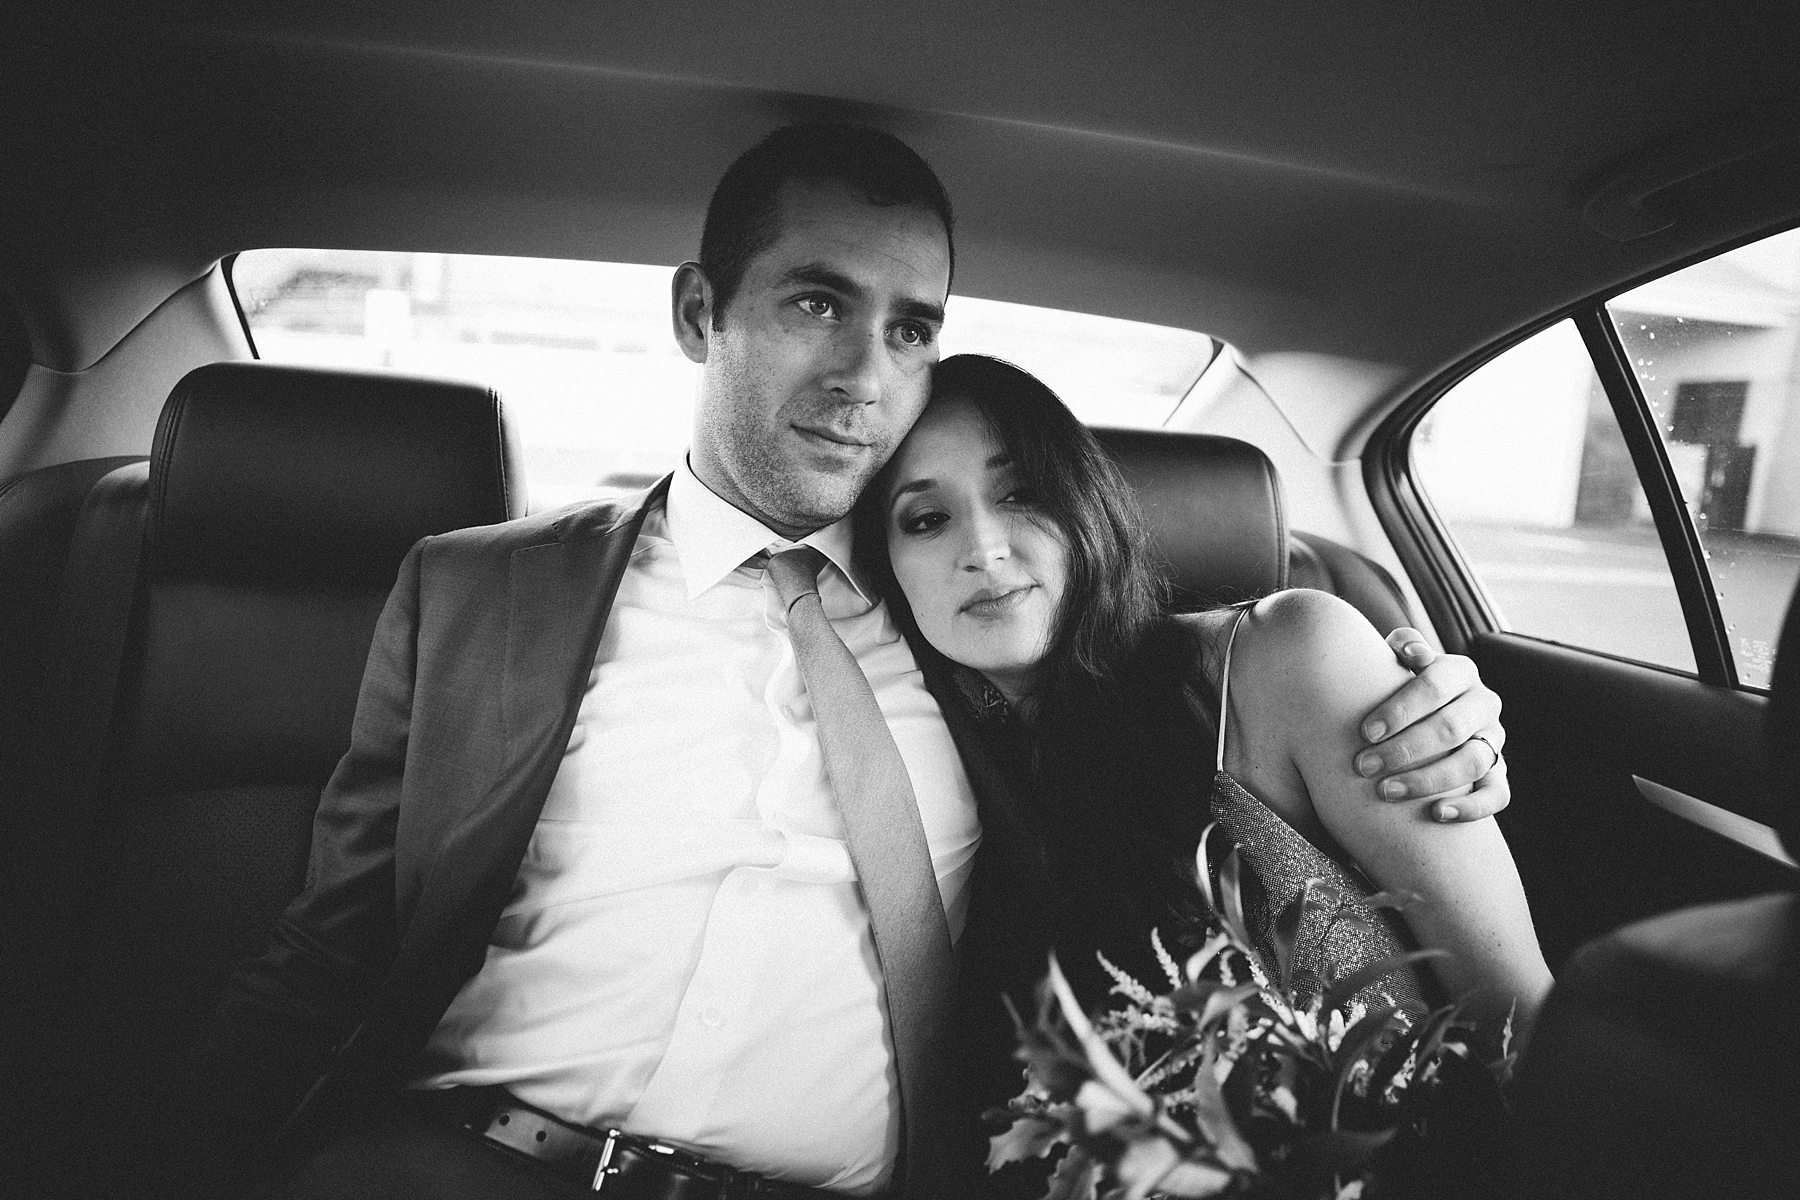 intimate-destination-wedding-photographer-outdoor_0114.jpg